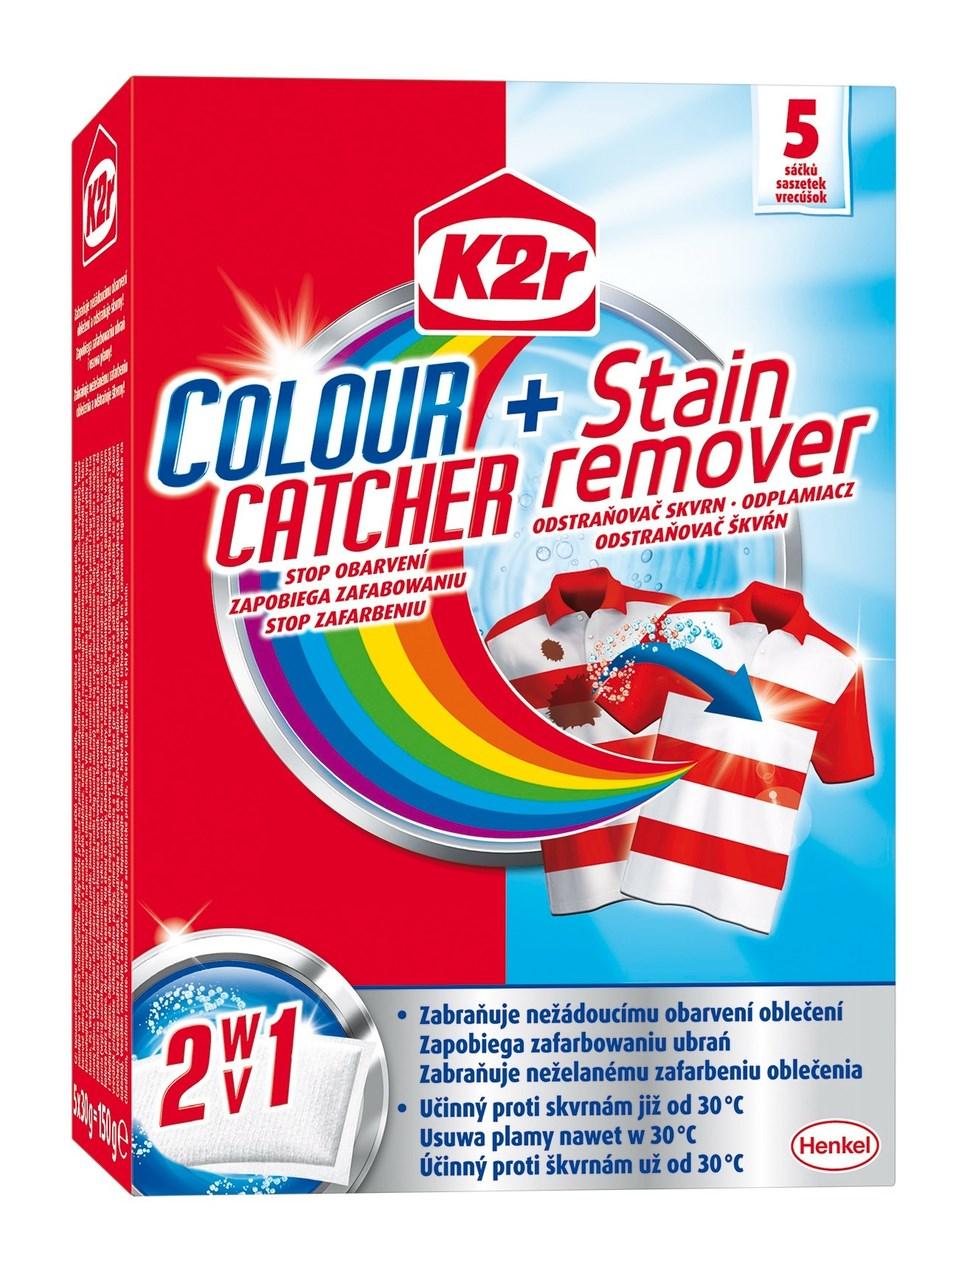 K2r Colour Catcher + Stain remover 1x5 ks